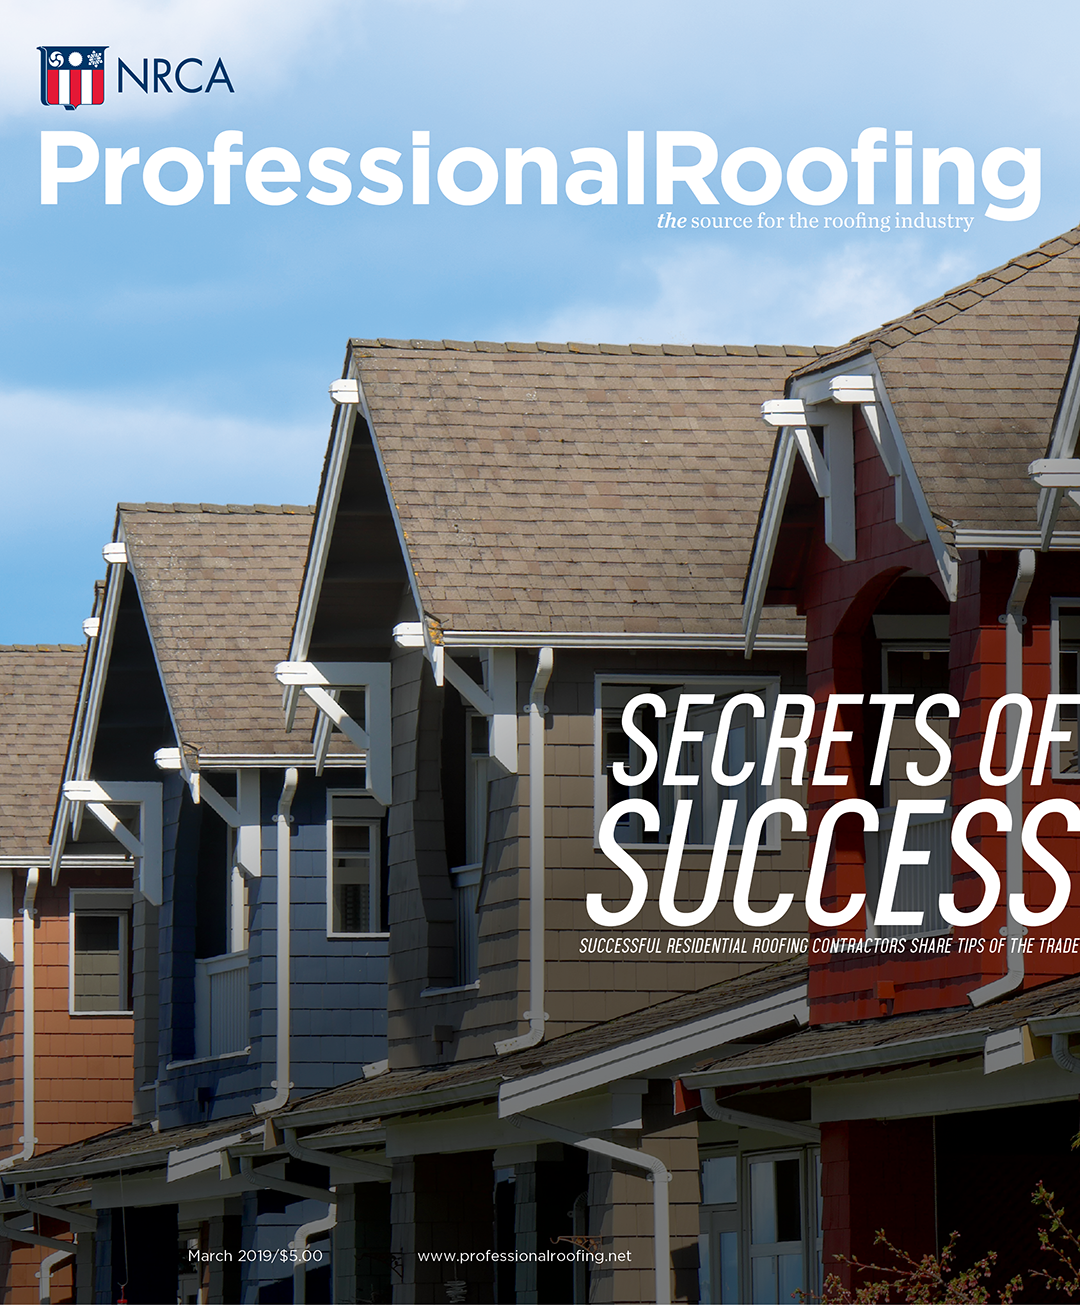 Professional Roofing Magazine 3/1/2019